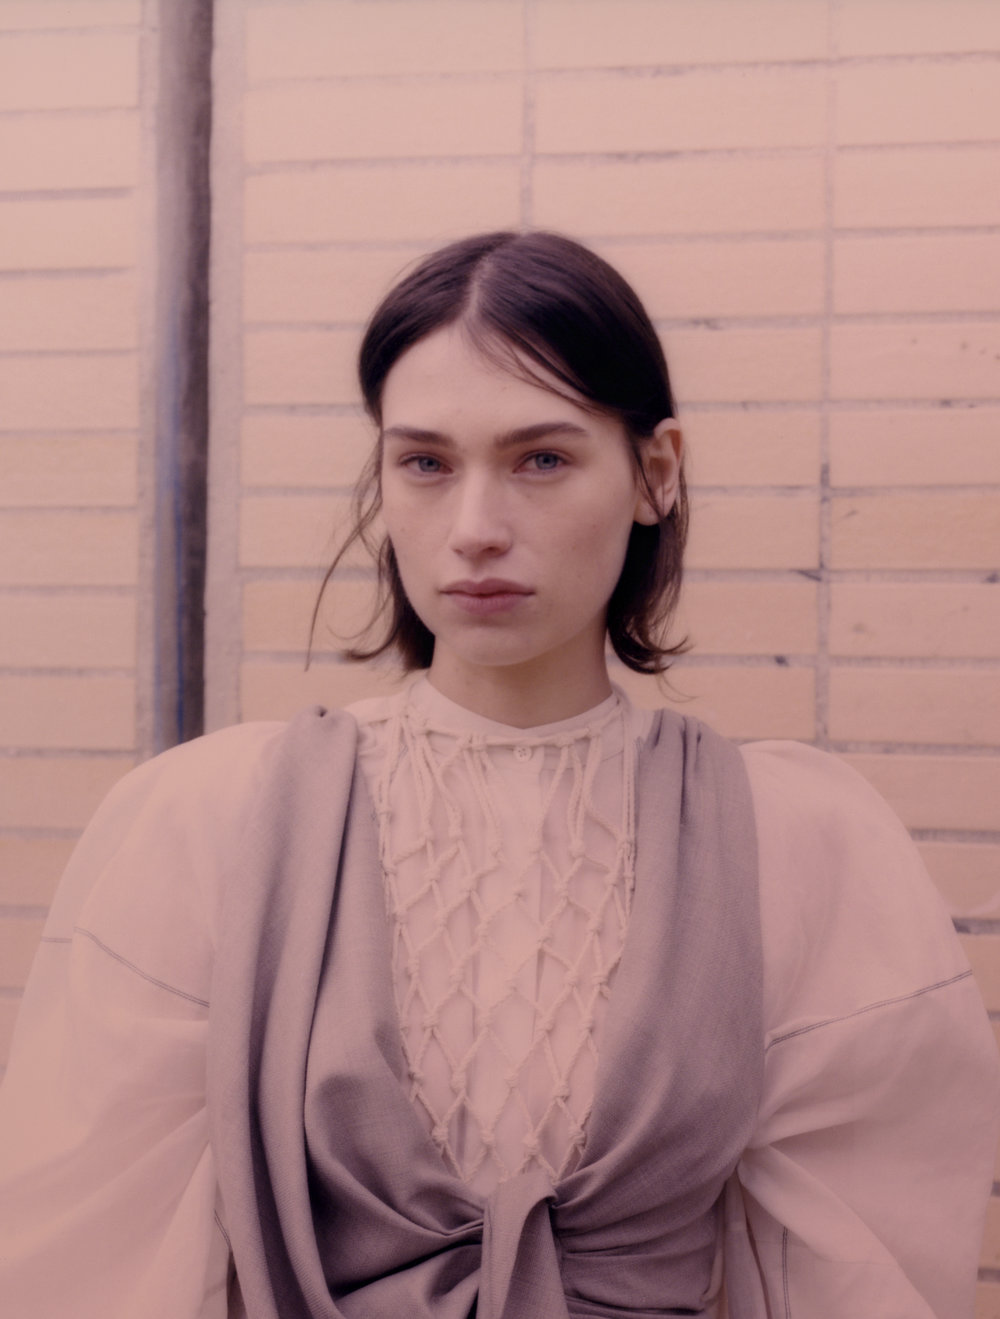 Rebecca viste top de  JACQUEMUS  y camisa de  JIL SANDER .